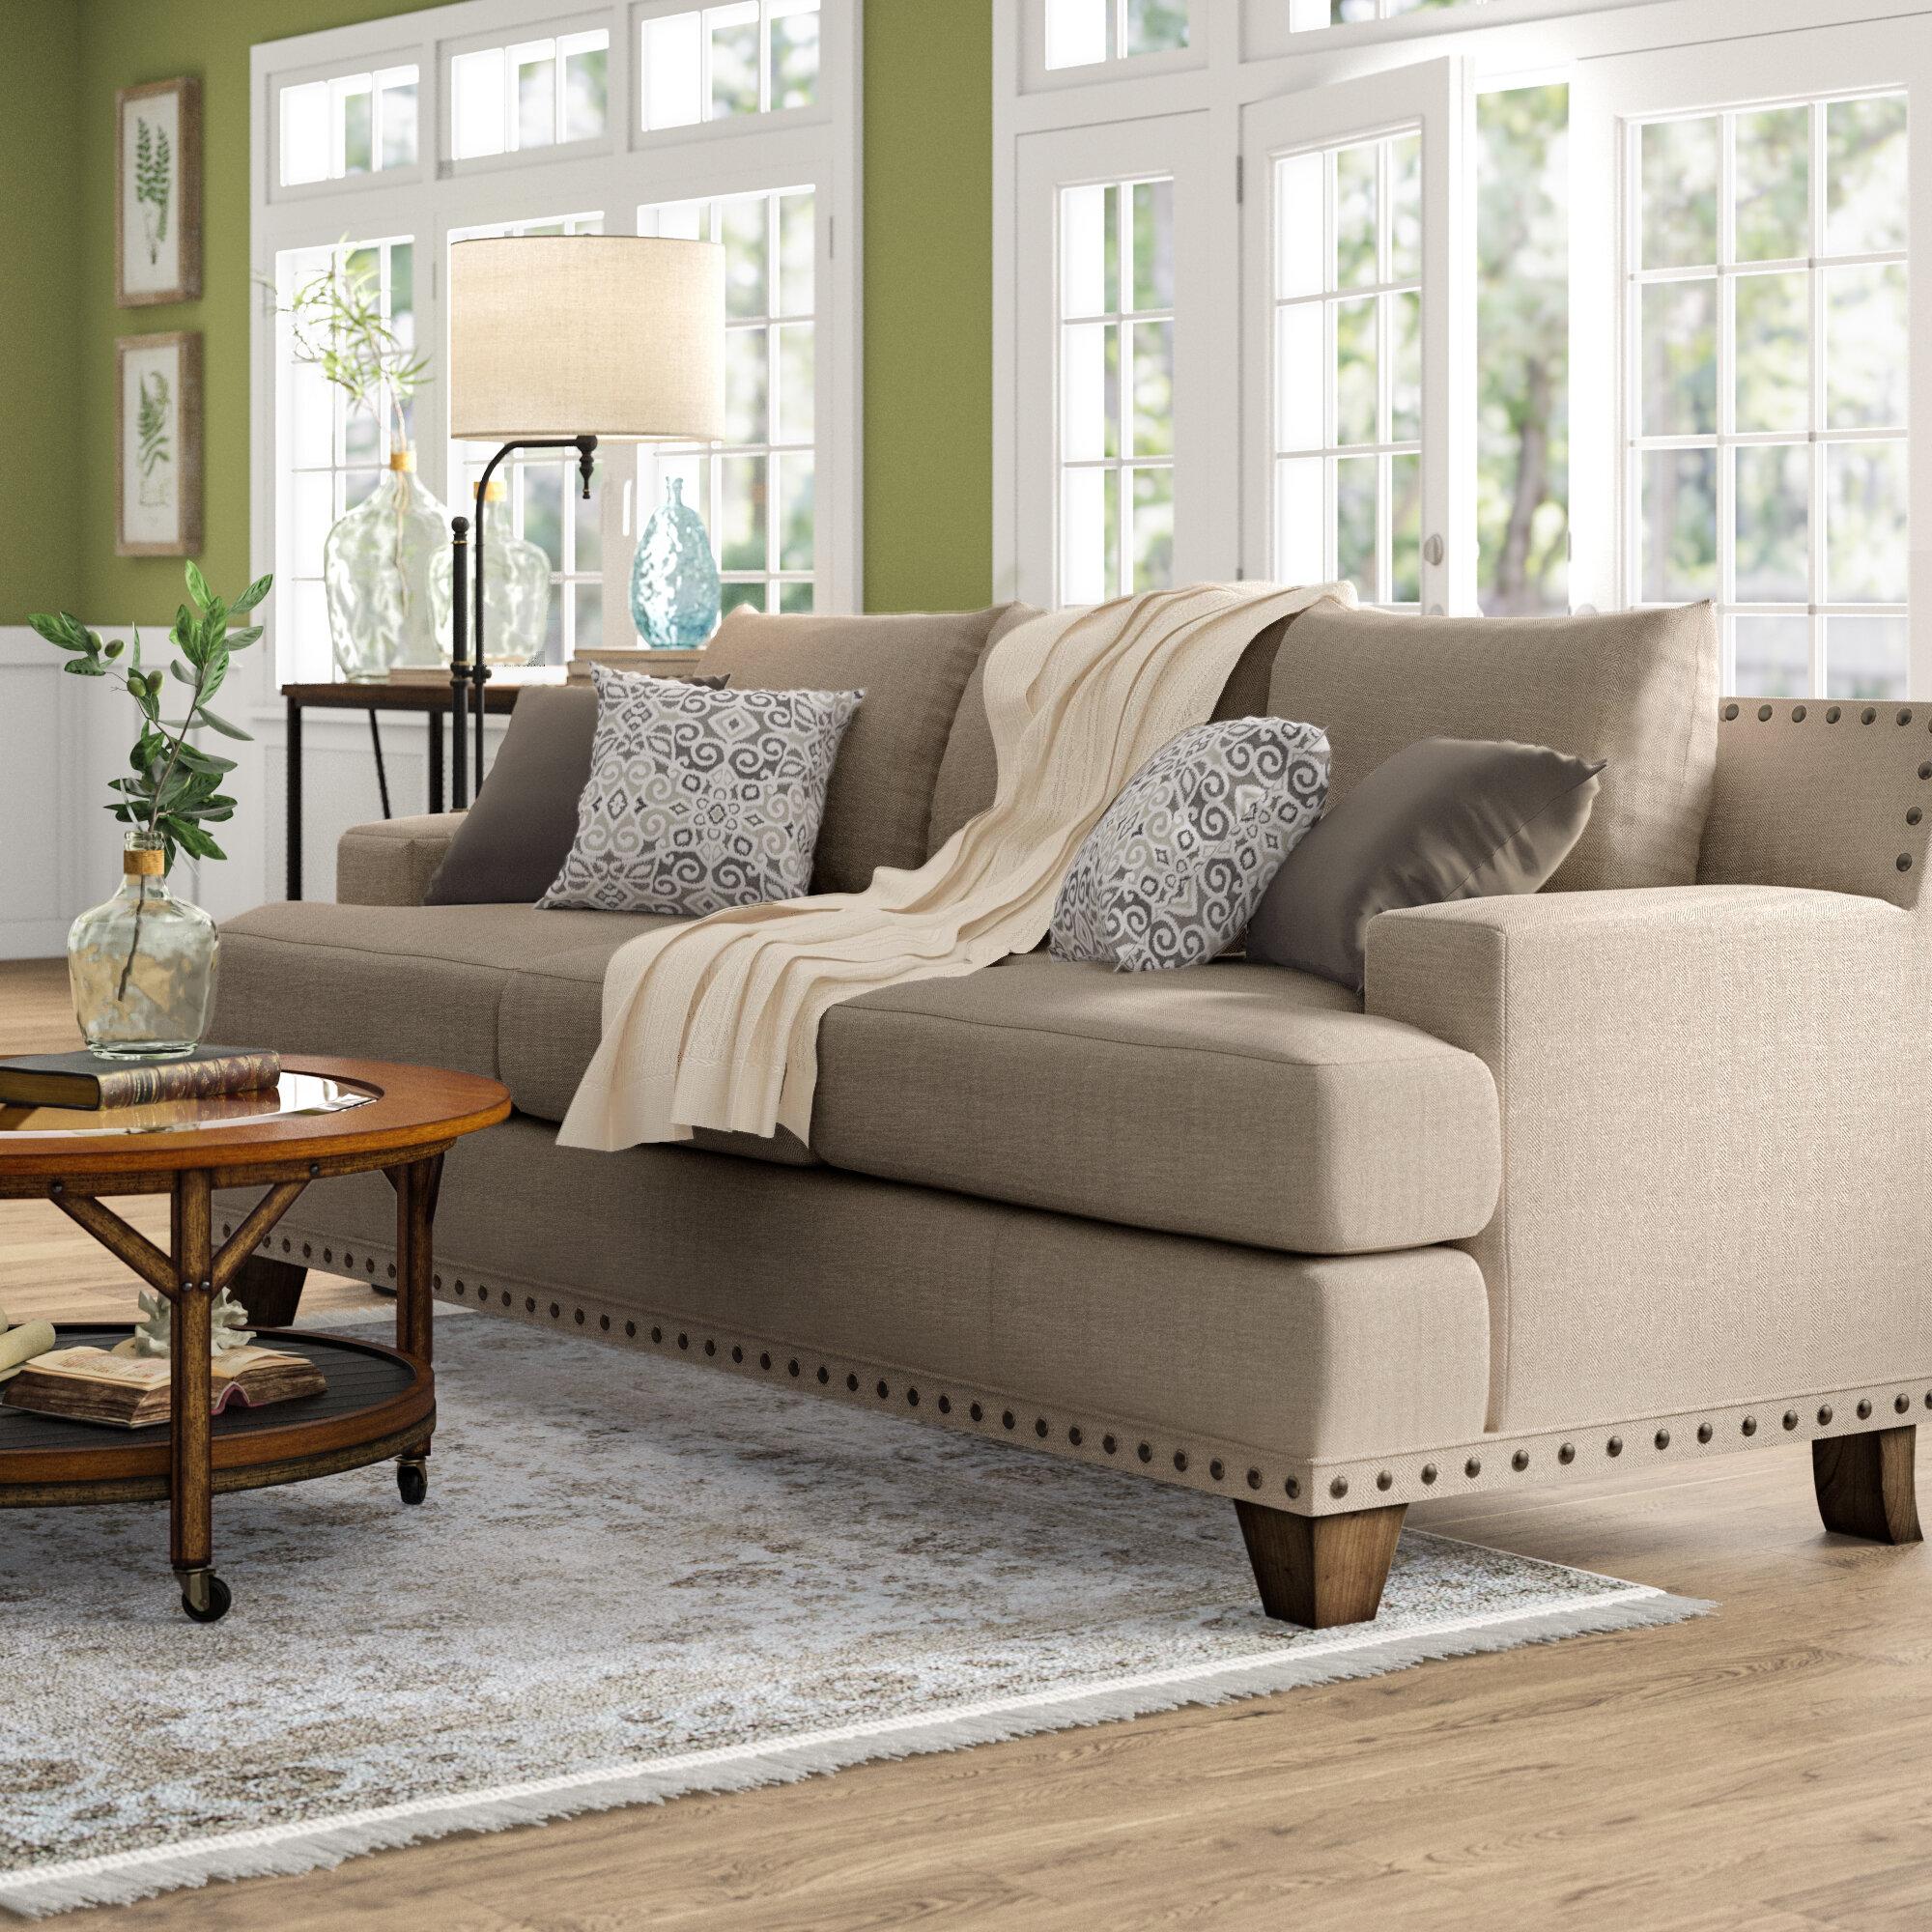 Birch lane heritage calila sofa reviews wayfair